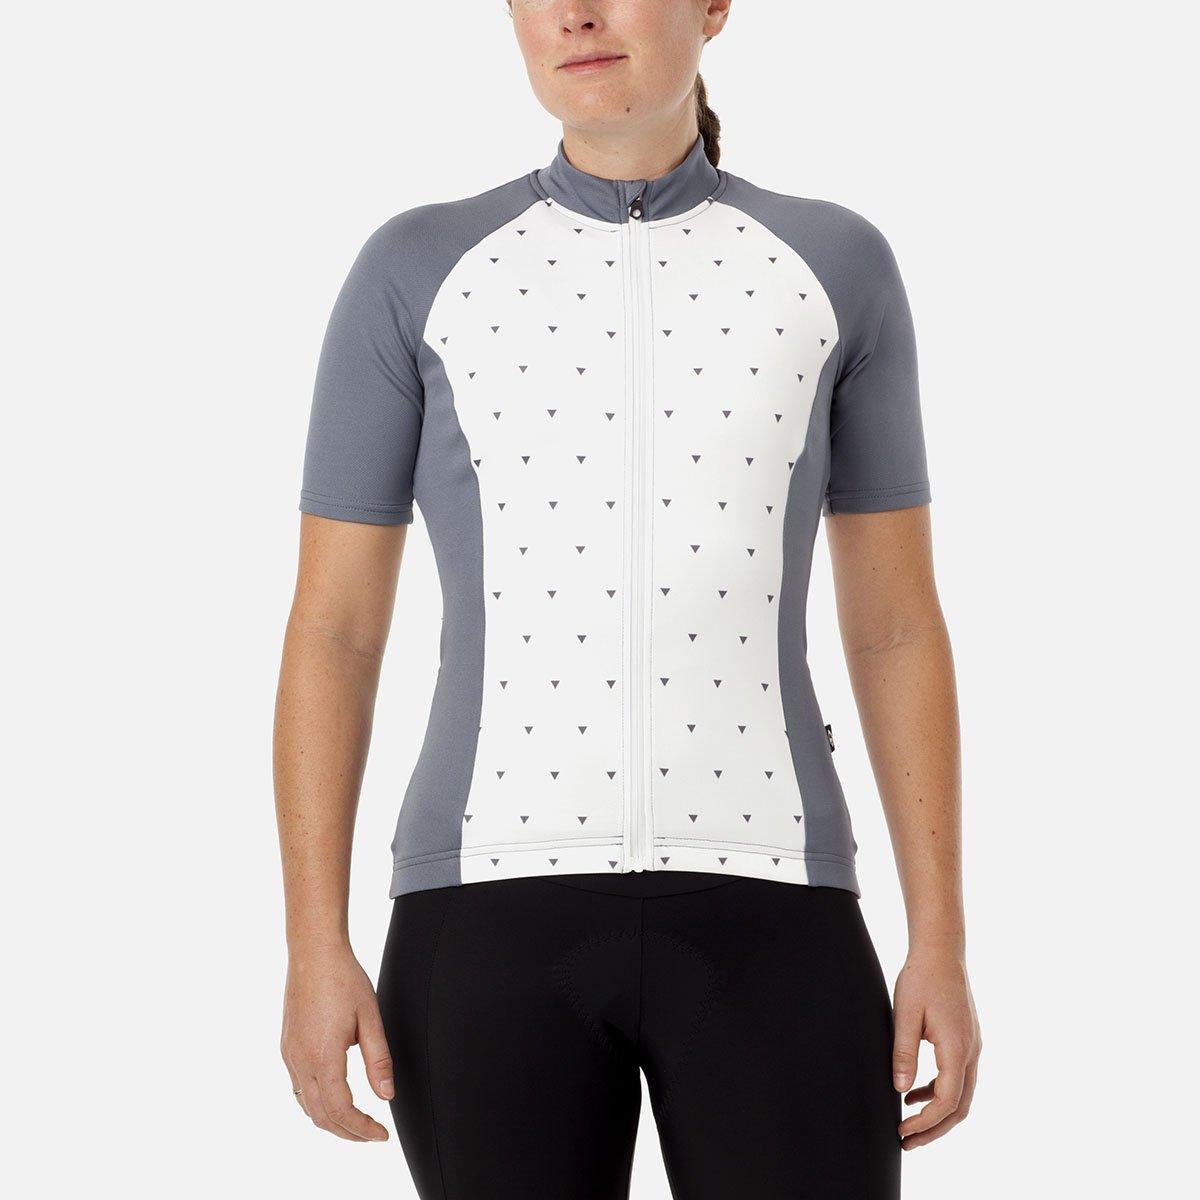 Giro Women's Chrono Sport Sublimated Short Sleeve Jersey 2017 Chrono Sport Sublimated